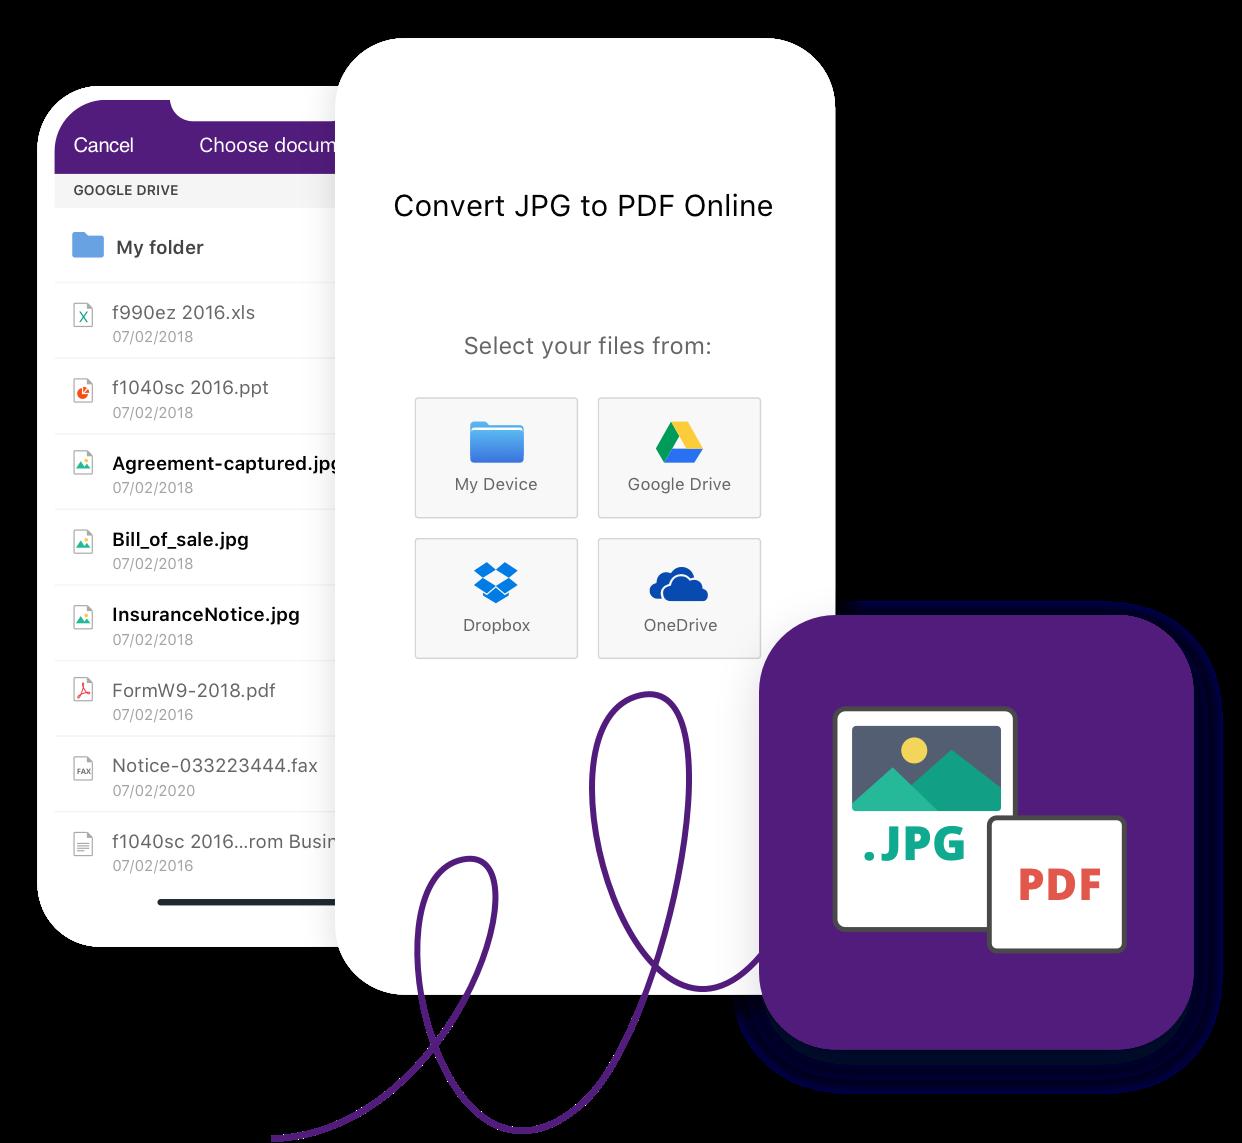 Jpg To Pdf Convert Jpg Images To Pdfs Online Free Converter Altoconvertjpgtopdf